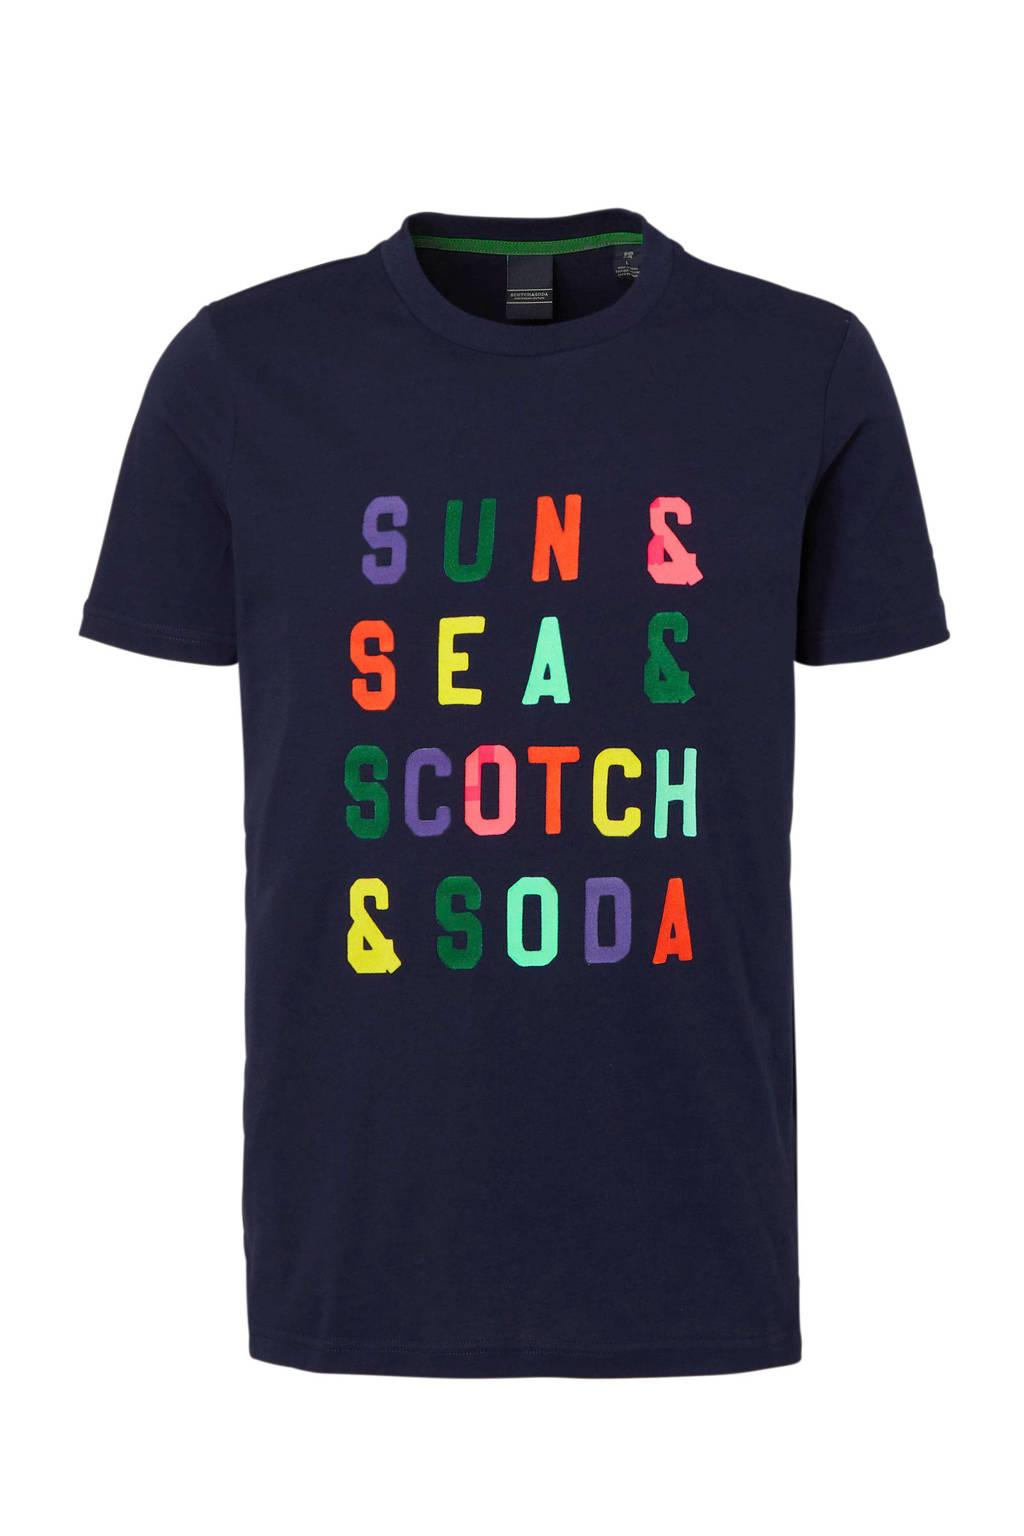 Scotch & Soda T-shirt met tekst, Donkerblauw/ Multi-kleuren